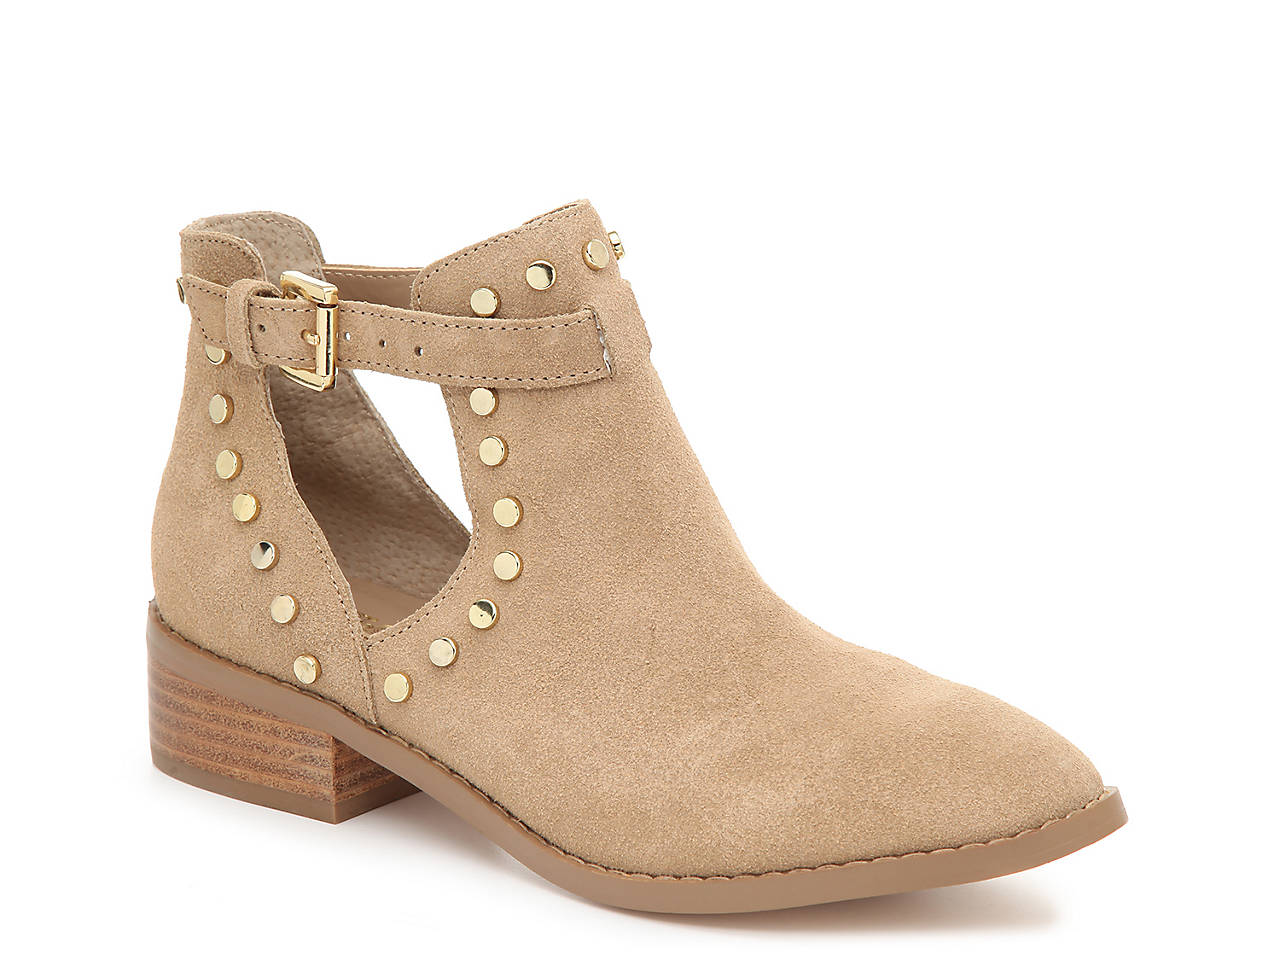 afcfae06d5f0 Carlos by Carlos Santana Blake Bootie Women s Shoes